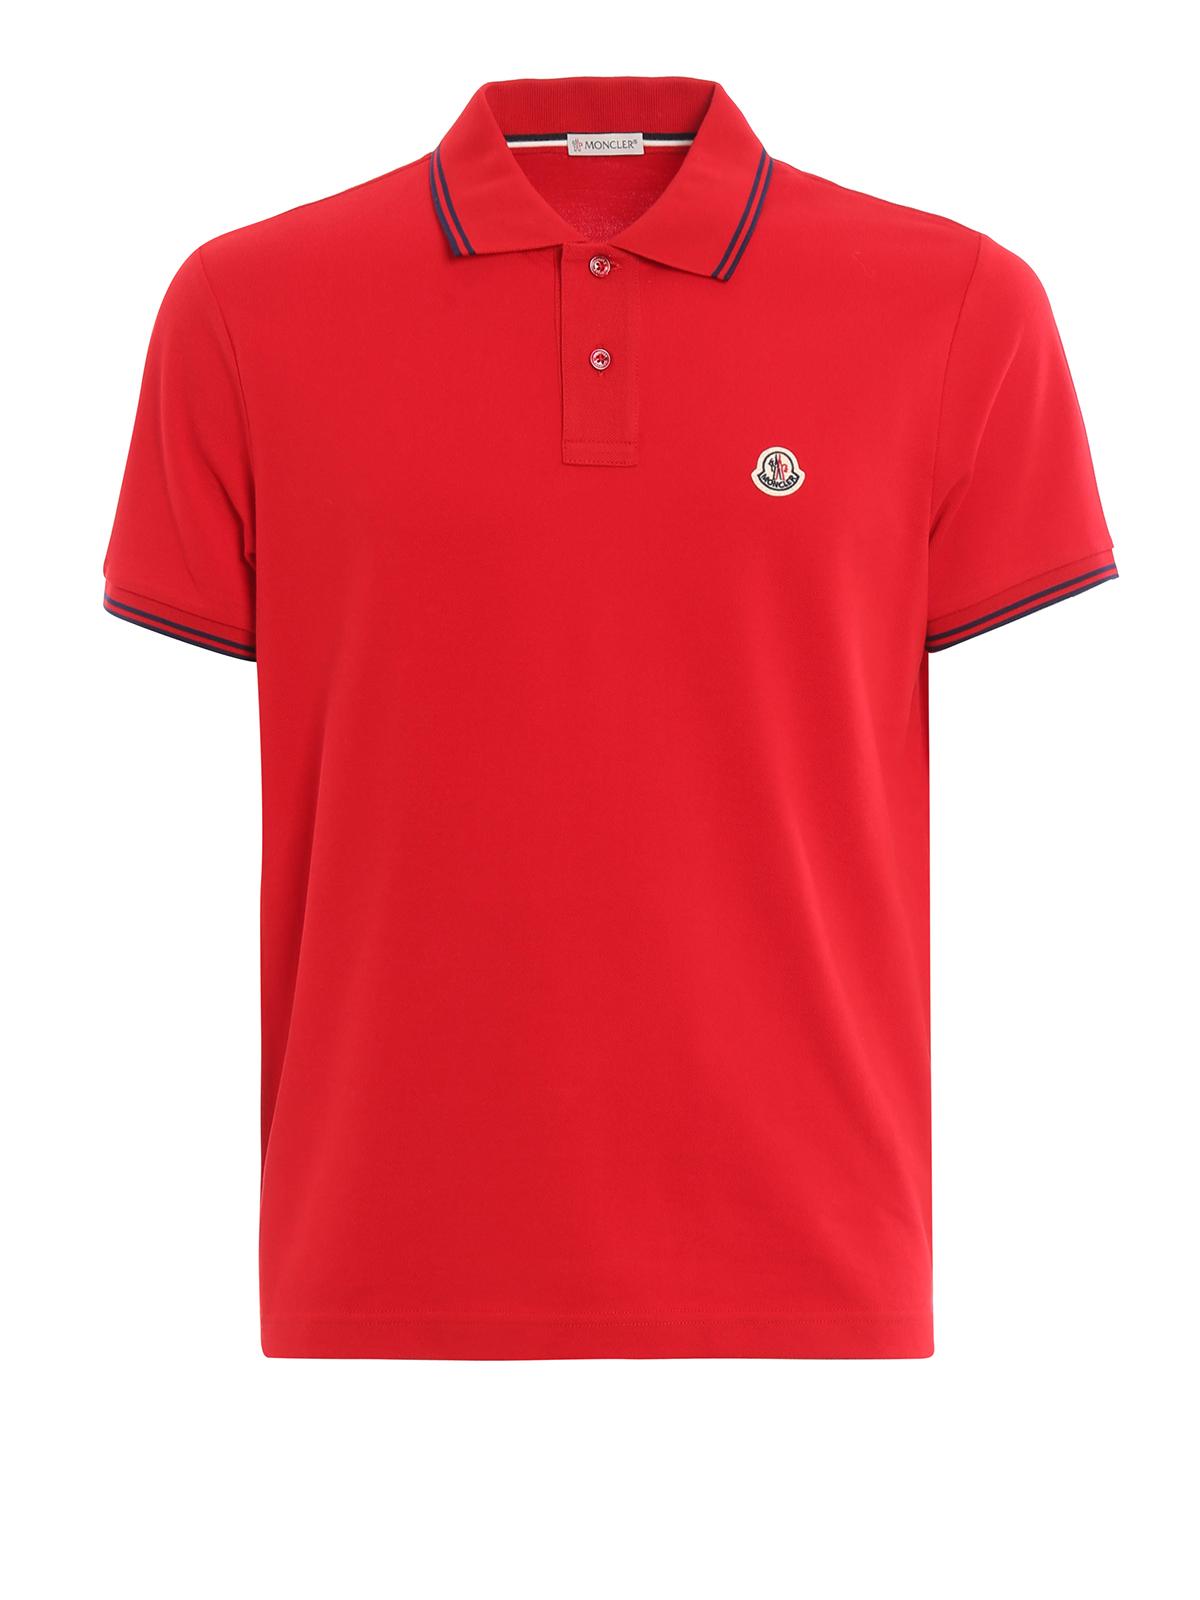 Cotton striped collar polo shirt by moncler polo shirts for Cotton on polo shirt